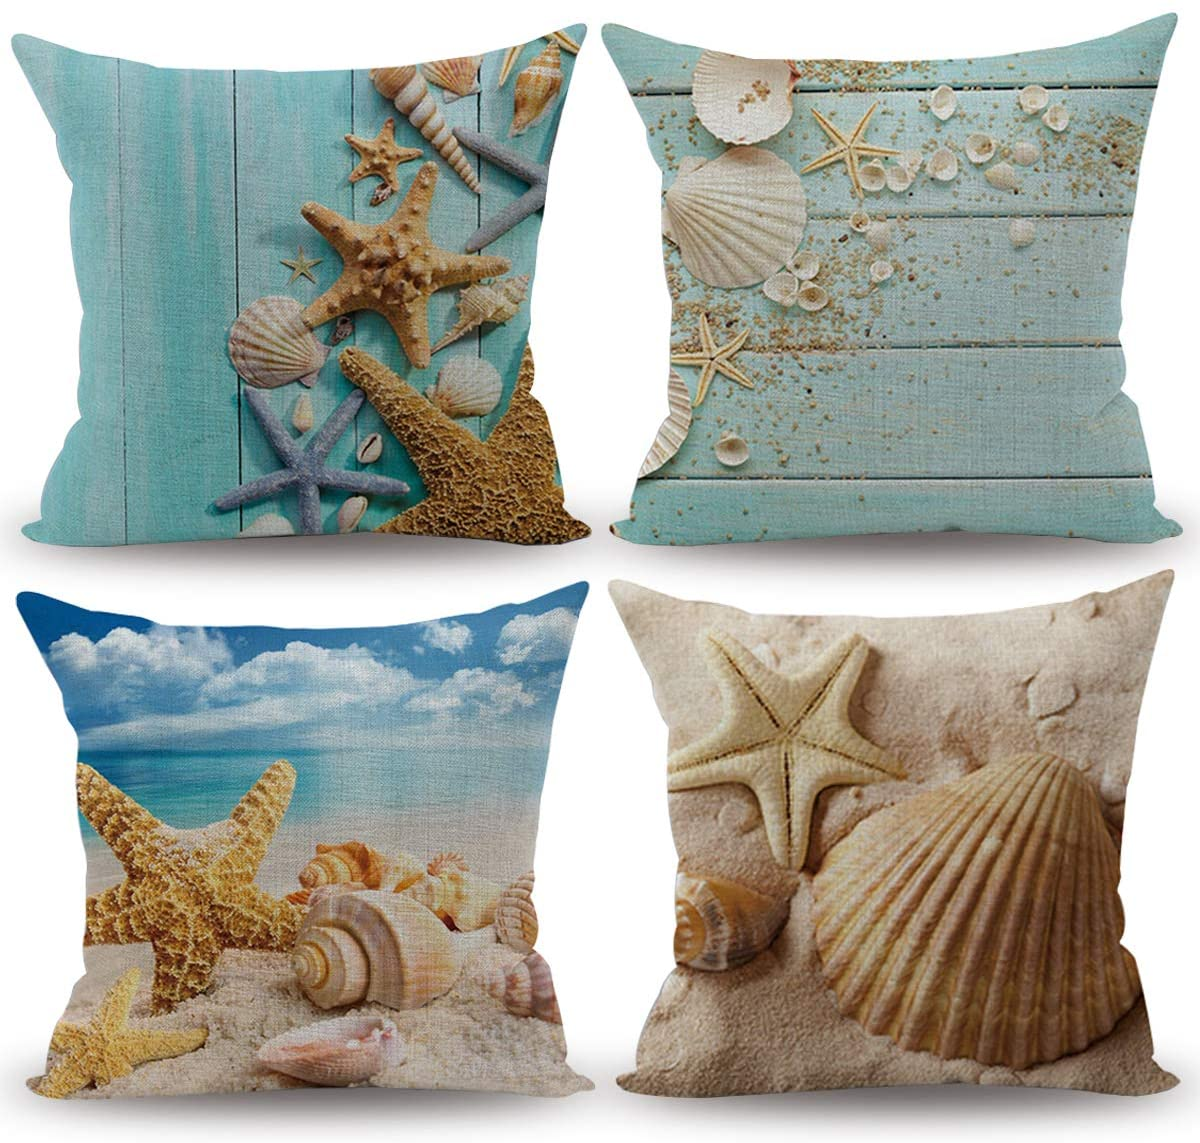 popeven beach throw pillow cover decorative ocean nautical theme coastal cushion covers for outdoor patio couch chair home fall christmas decor 4